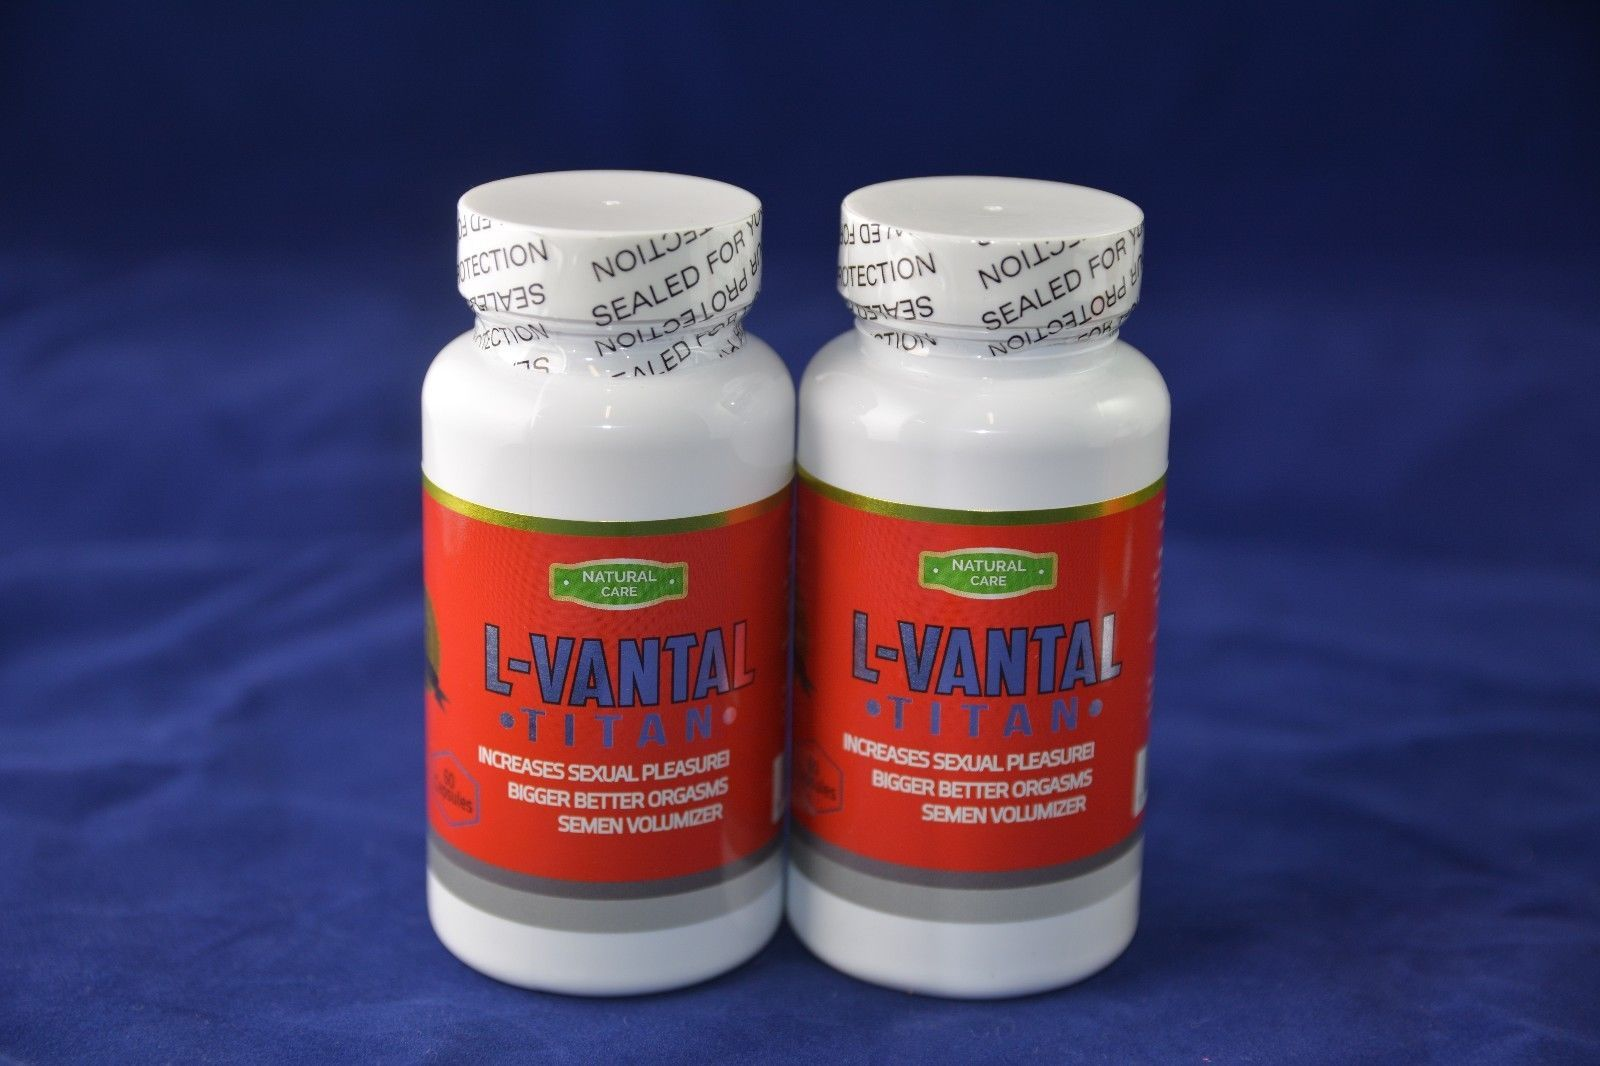 2 L-vantal, MAKE YOUR PENIS BIGGER Pills-Get Larger Grow